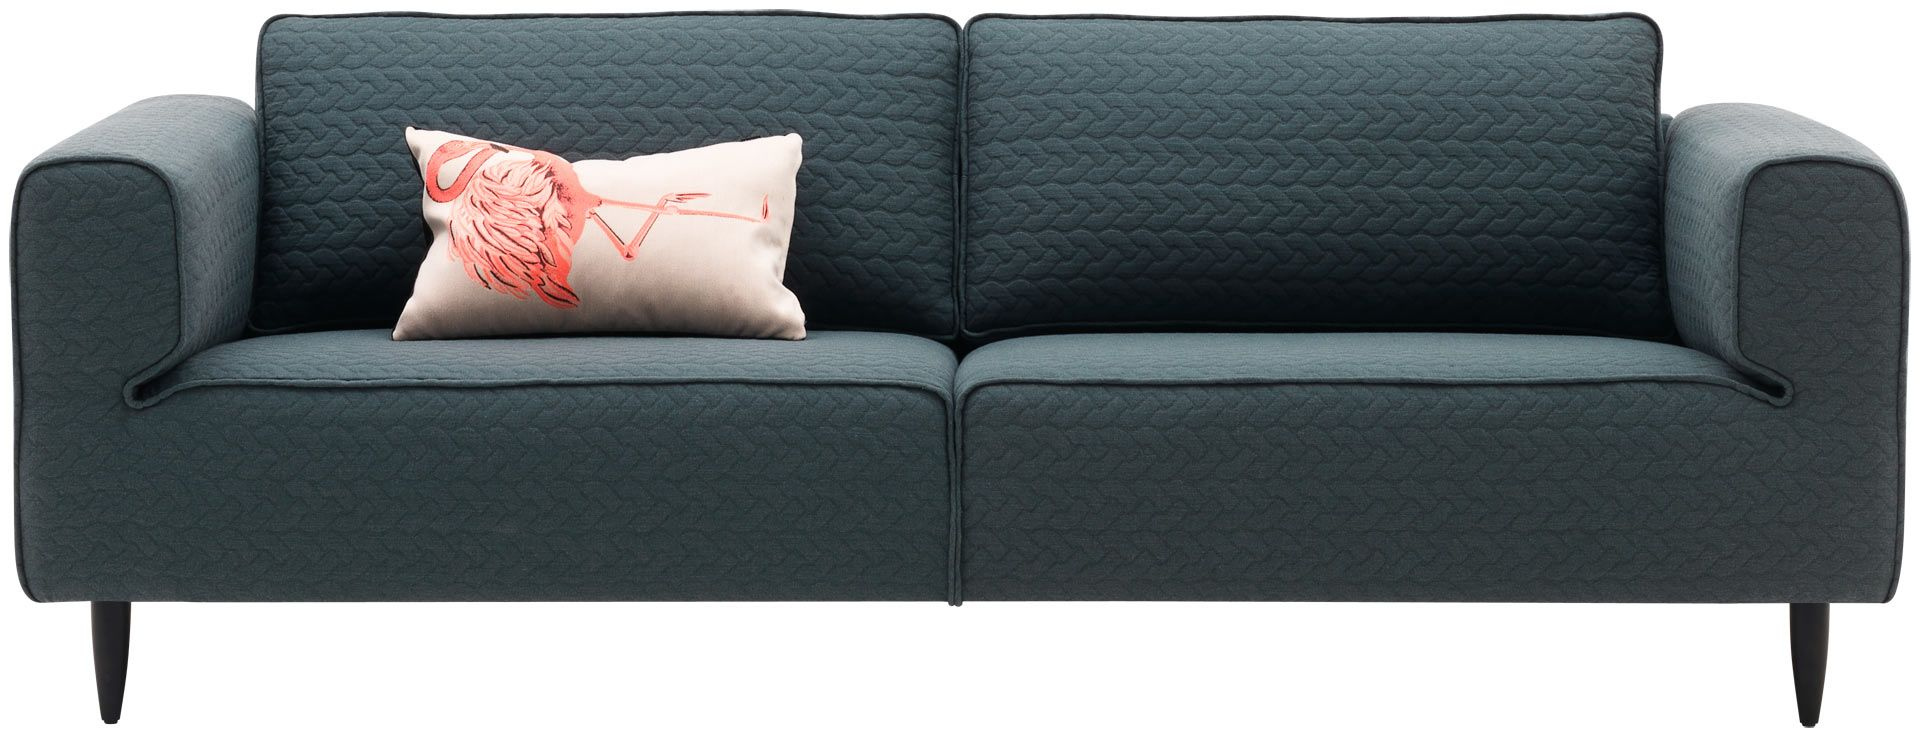 Surprising Boconcept Arco Sofa Design Sofa Qualitat Von Boconcept Unemploymentrelief Wooden Chair Designs For Living Room Unemploymentrelieforg